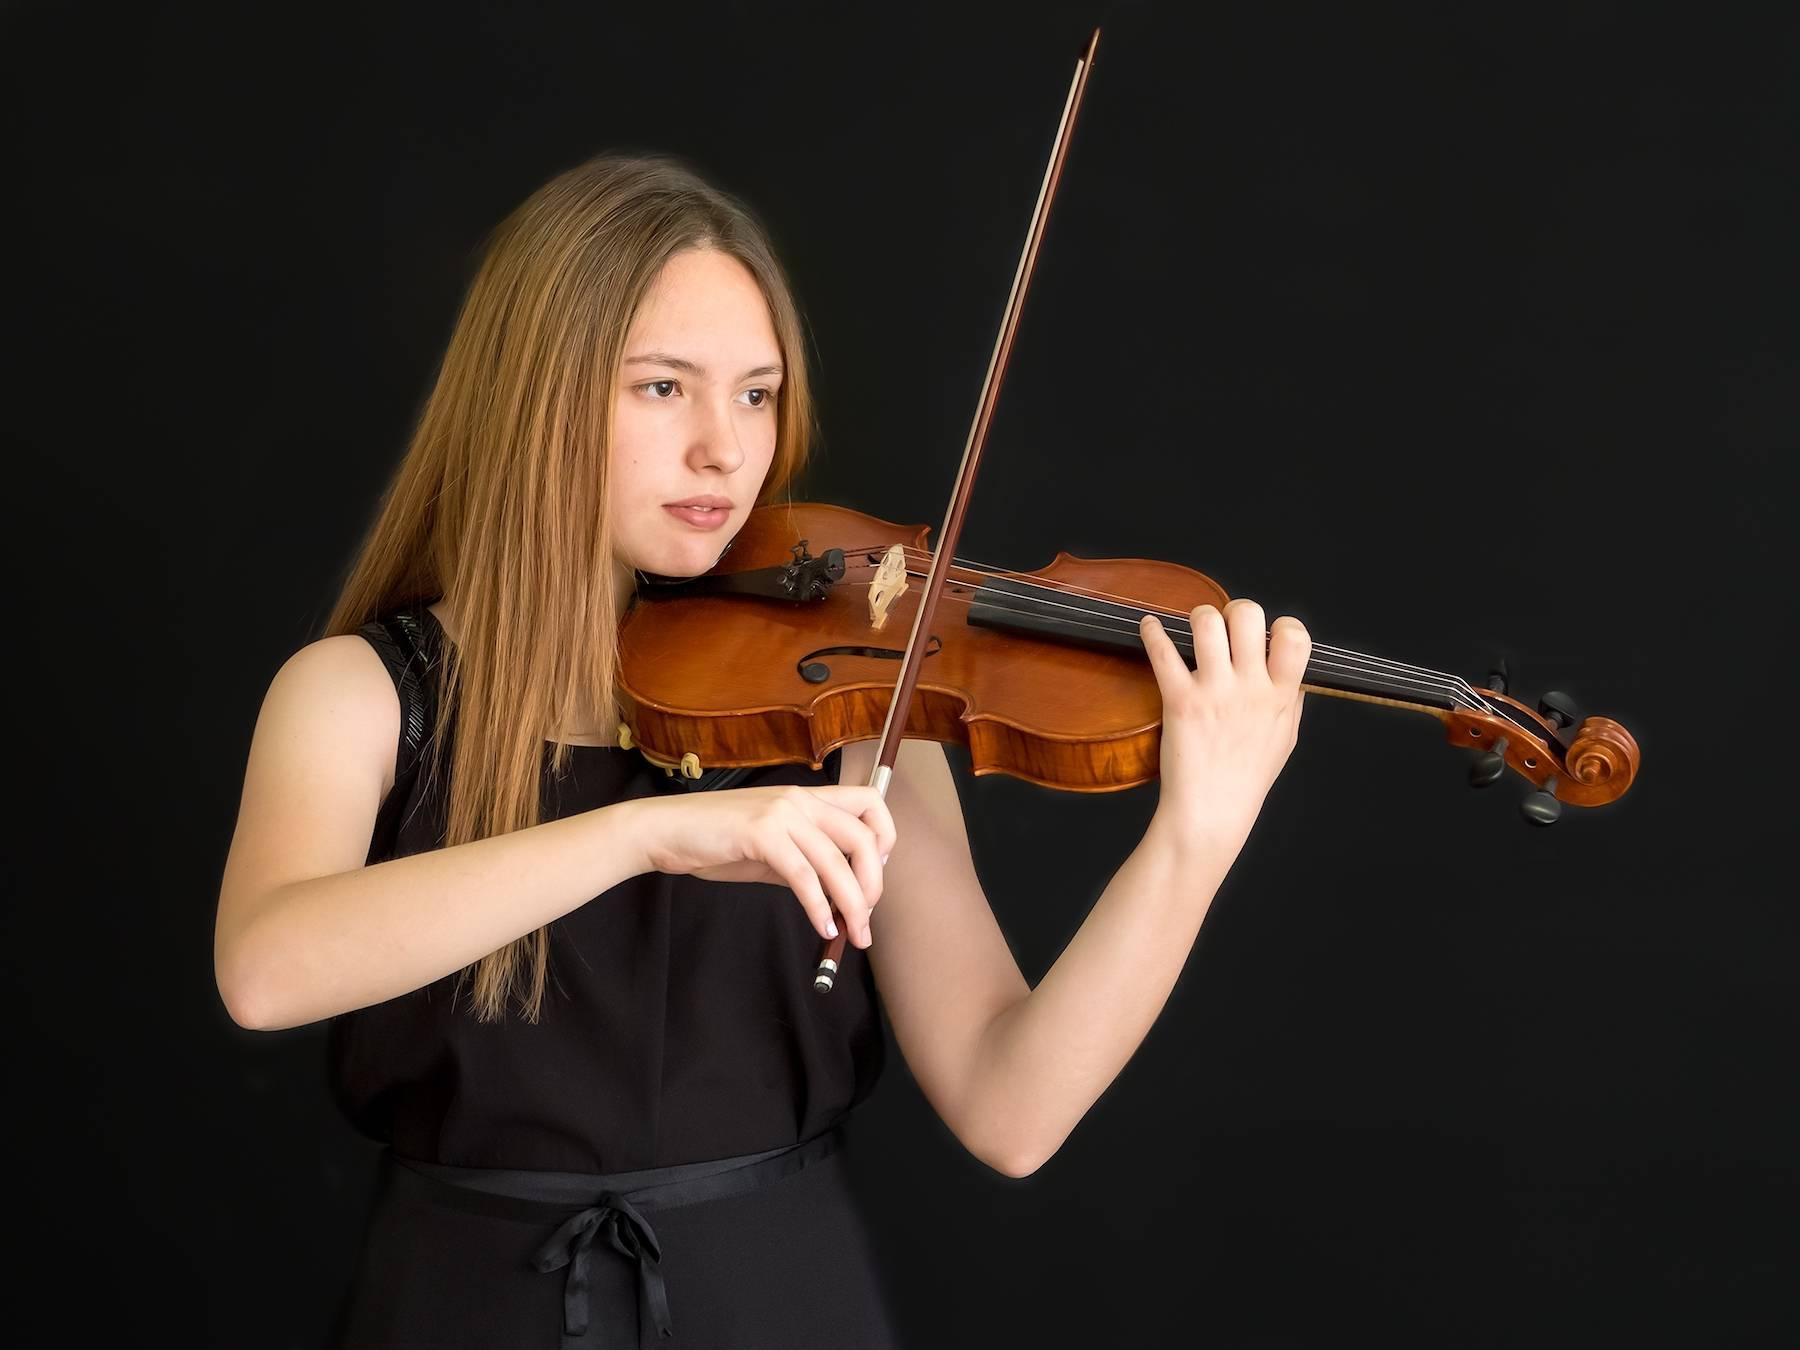 violinista Blanca Mateo Raseron herencia ciudad real - La joven violinista Blanca Mateo Raserón con la Moonlight Symphony